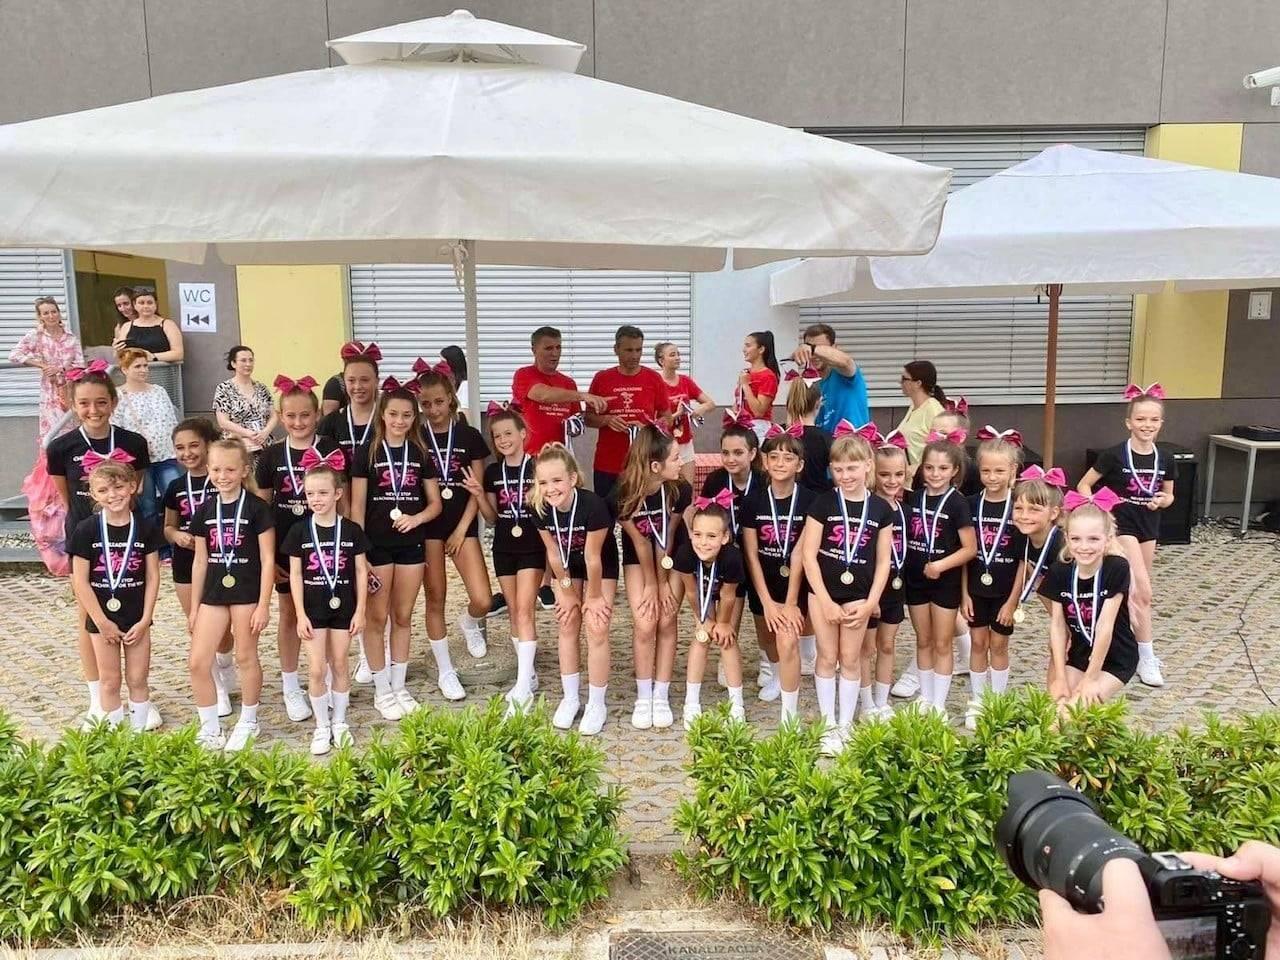 BRAVO! Cheerleadersice iz Umaga pomele konkurenciju!